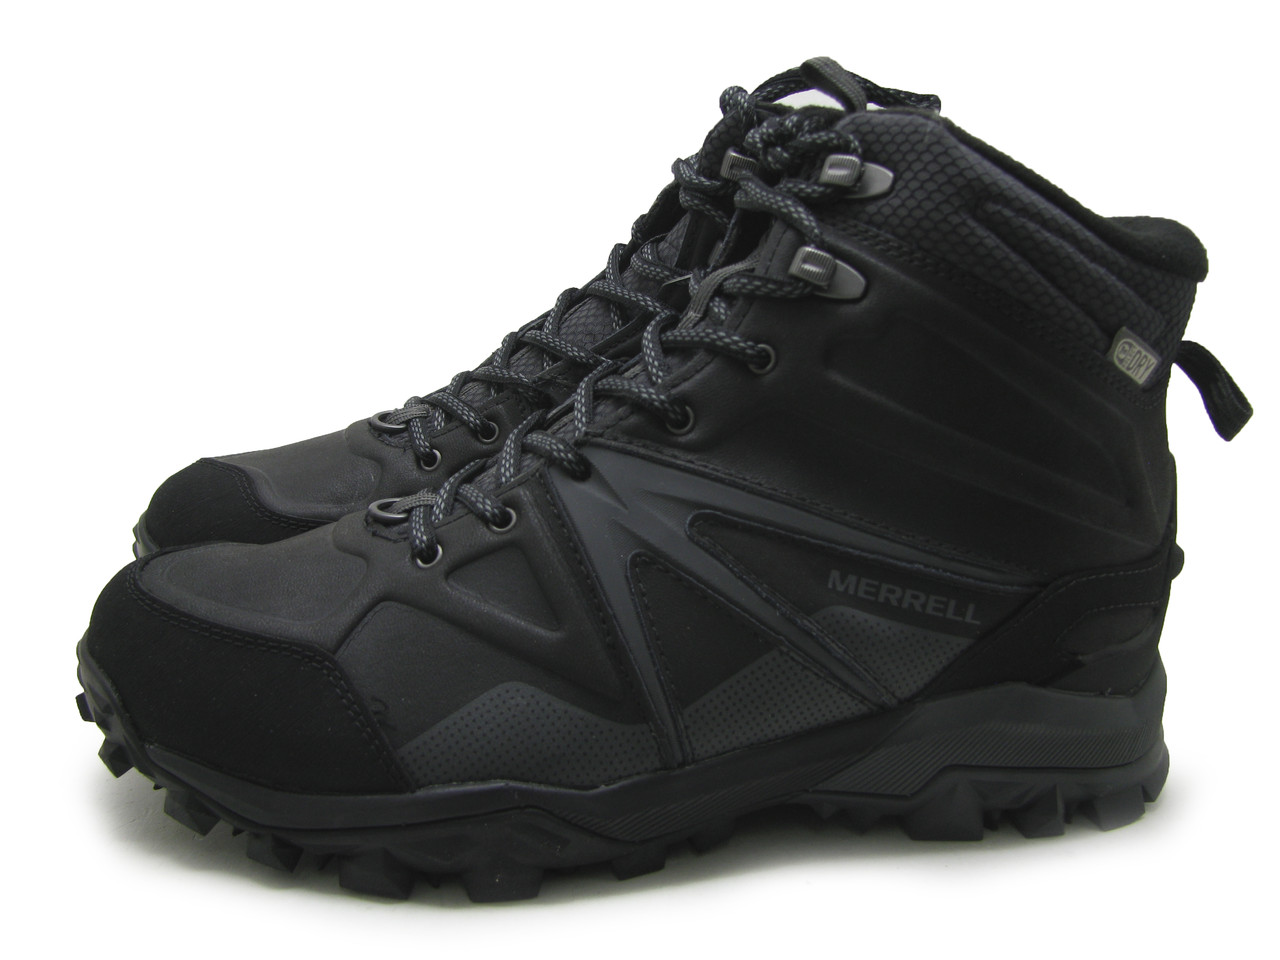 Ботинки зимние мужские Merrell CAPRA GLACIAL ICE+ MID WTPF